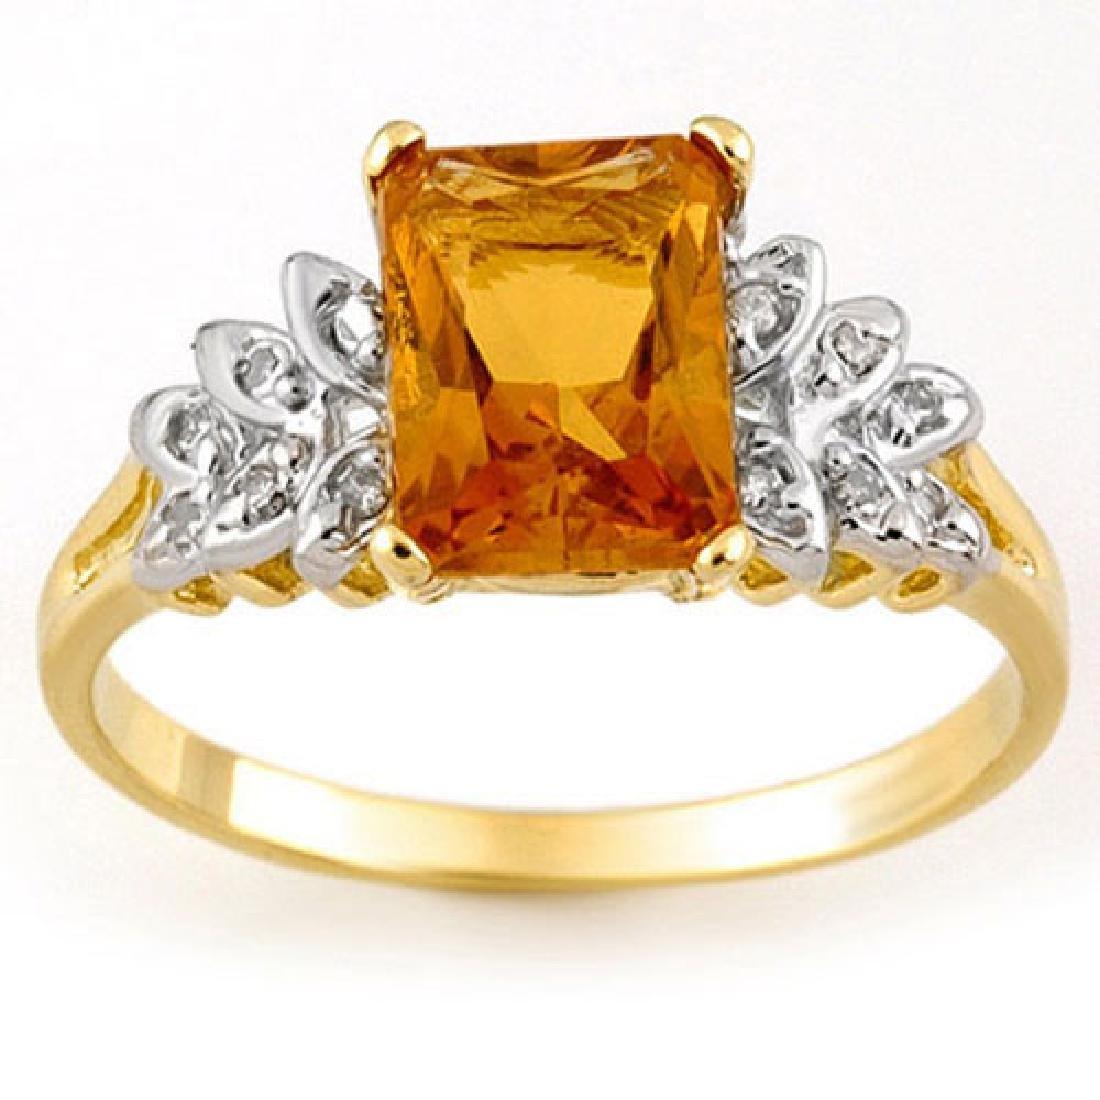 2.12 CTW Citrine & Diamond Ring 10K Yellow Gold